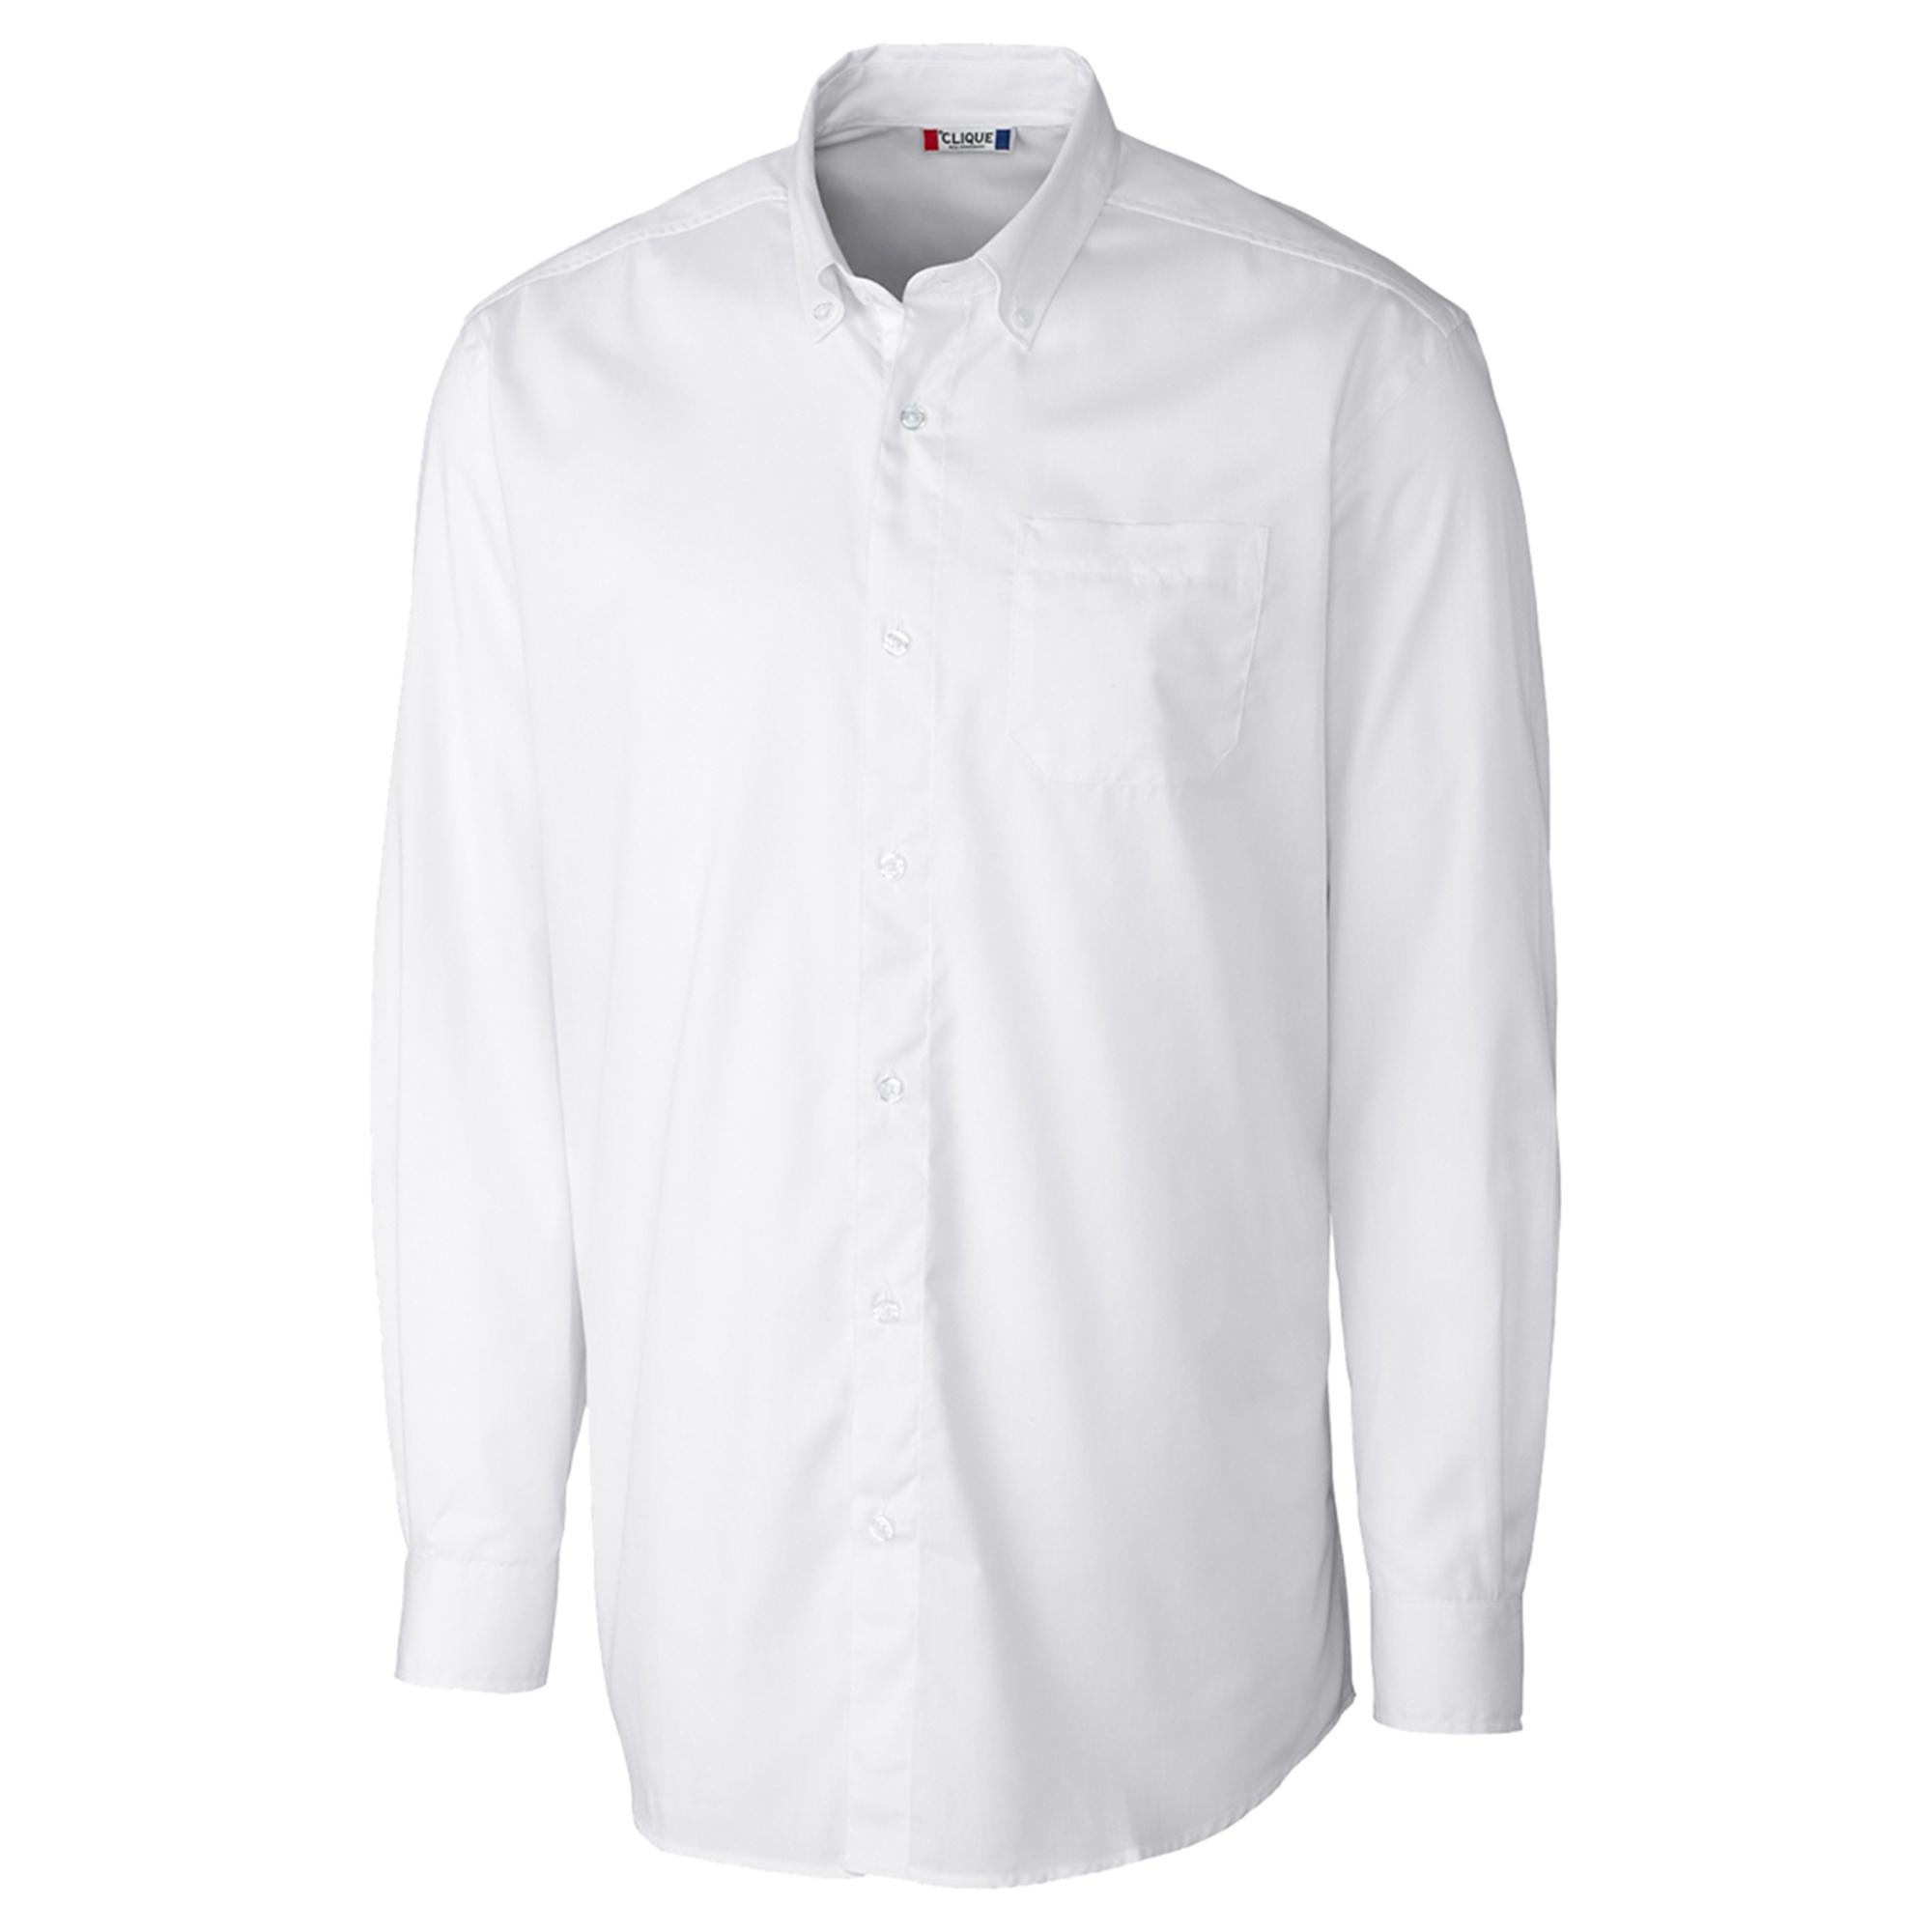 Cutter and Buck BDW00053 Men's Straight collar Comfort Chest pocket Plaid Shirt